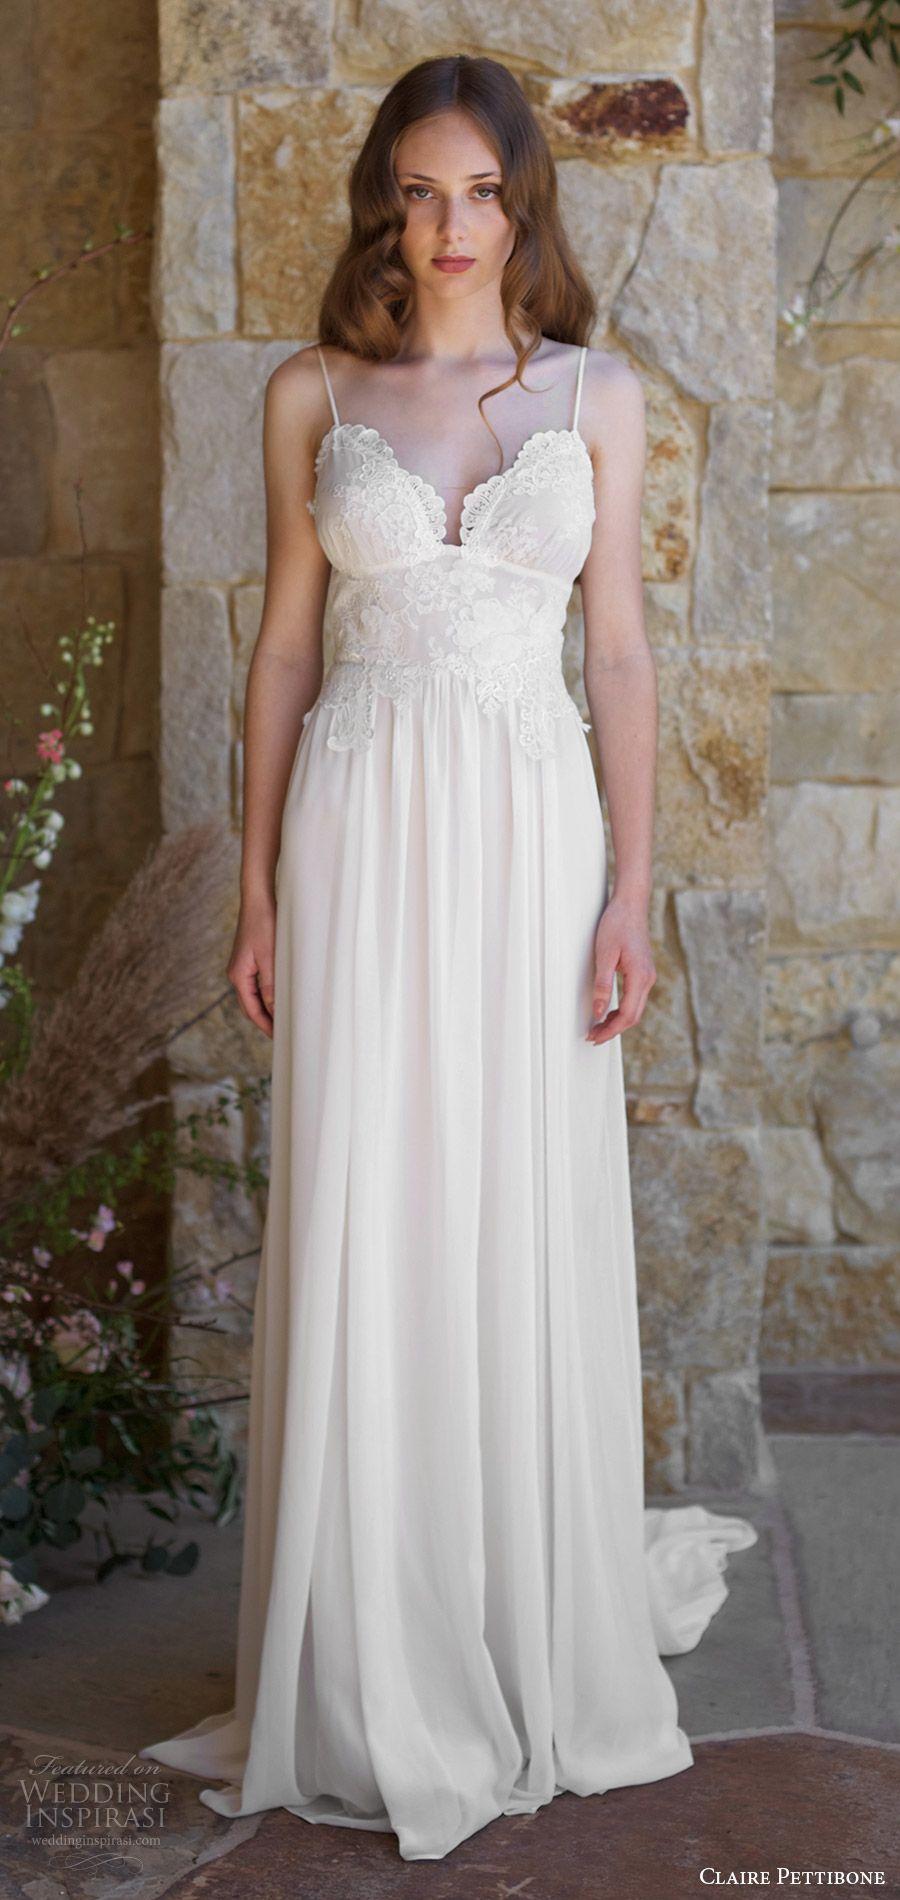 Claire pettibone romantique spring wedding dresses u the